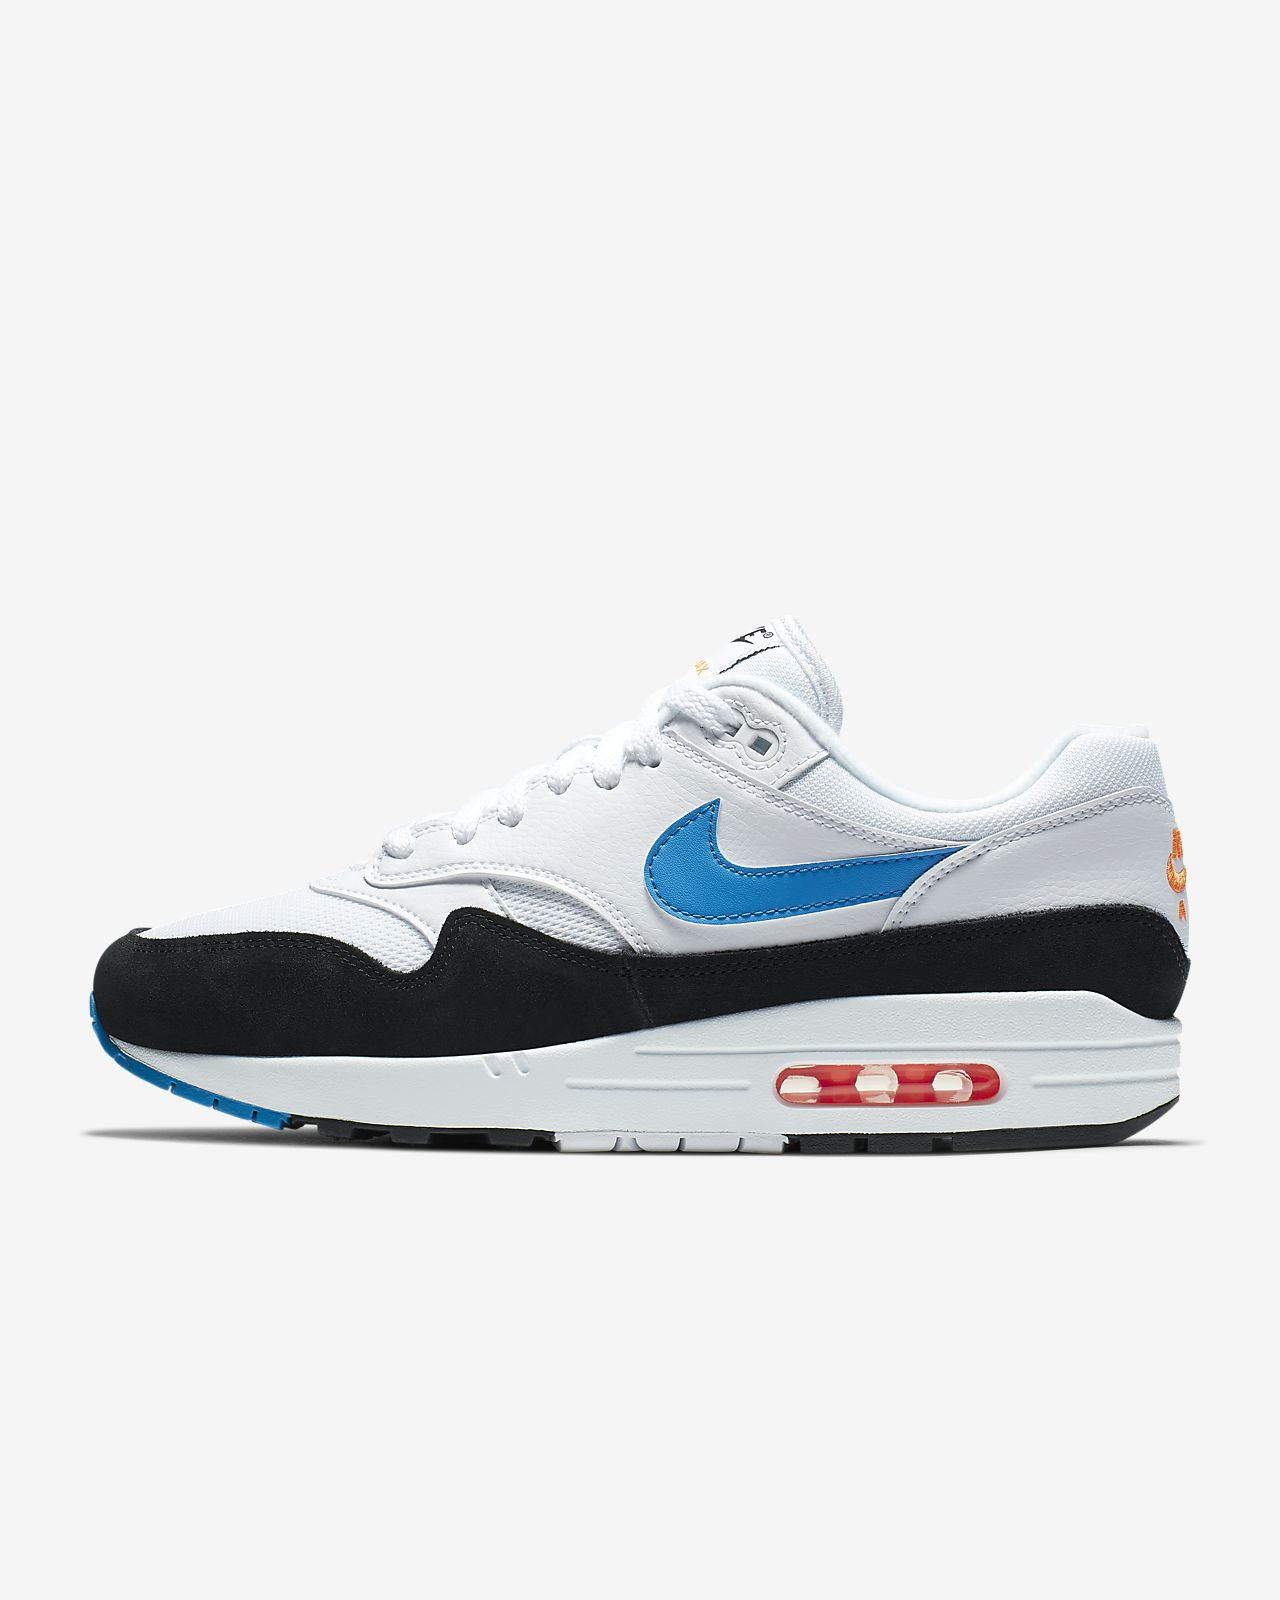 nike air max 1. :timeless kicks. | Style | Sneakers nike